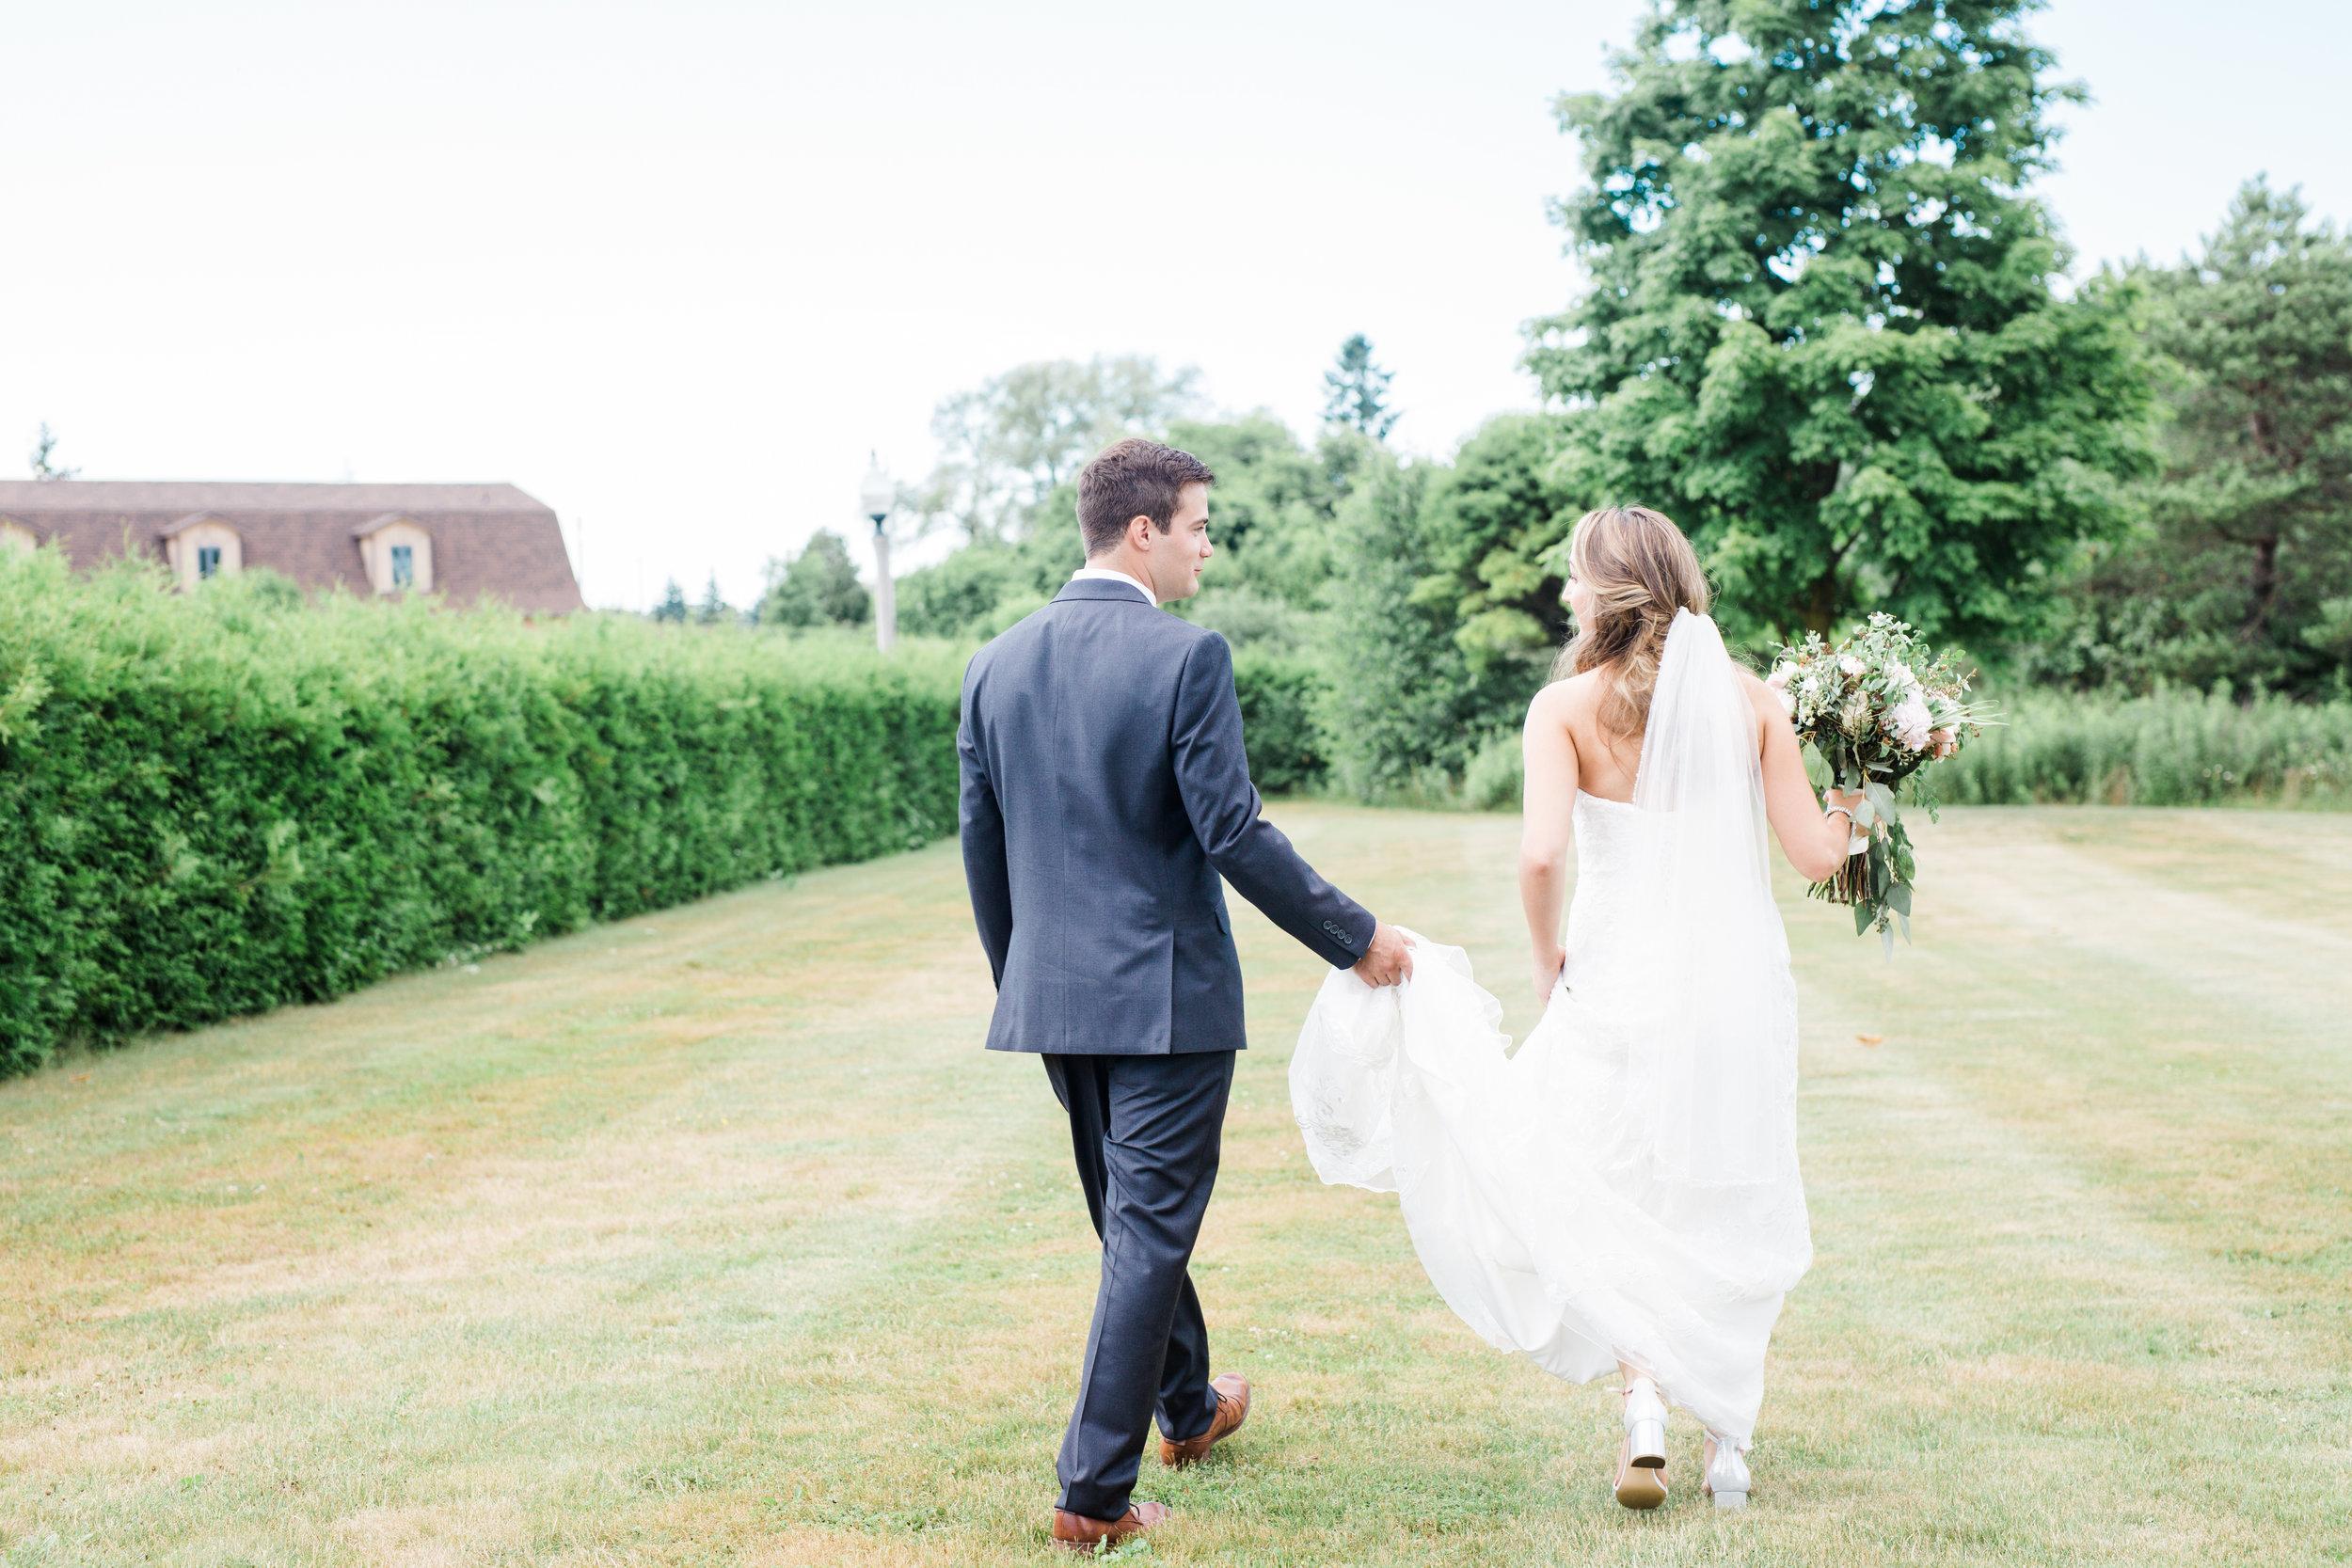 20180707.Wedding.SarahMarc-522.jpg